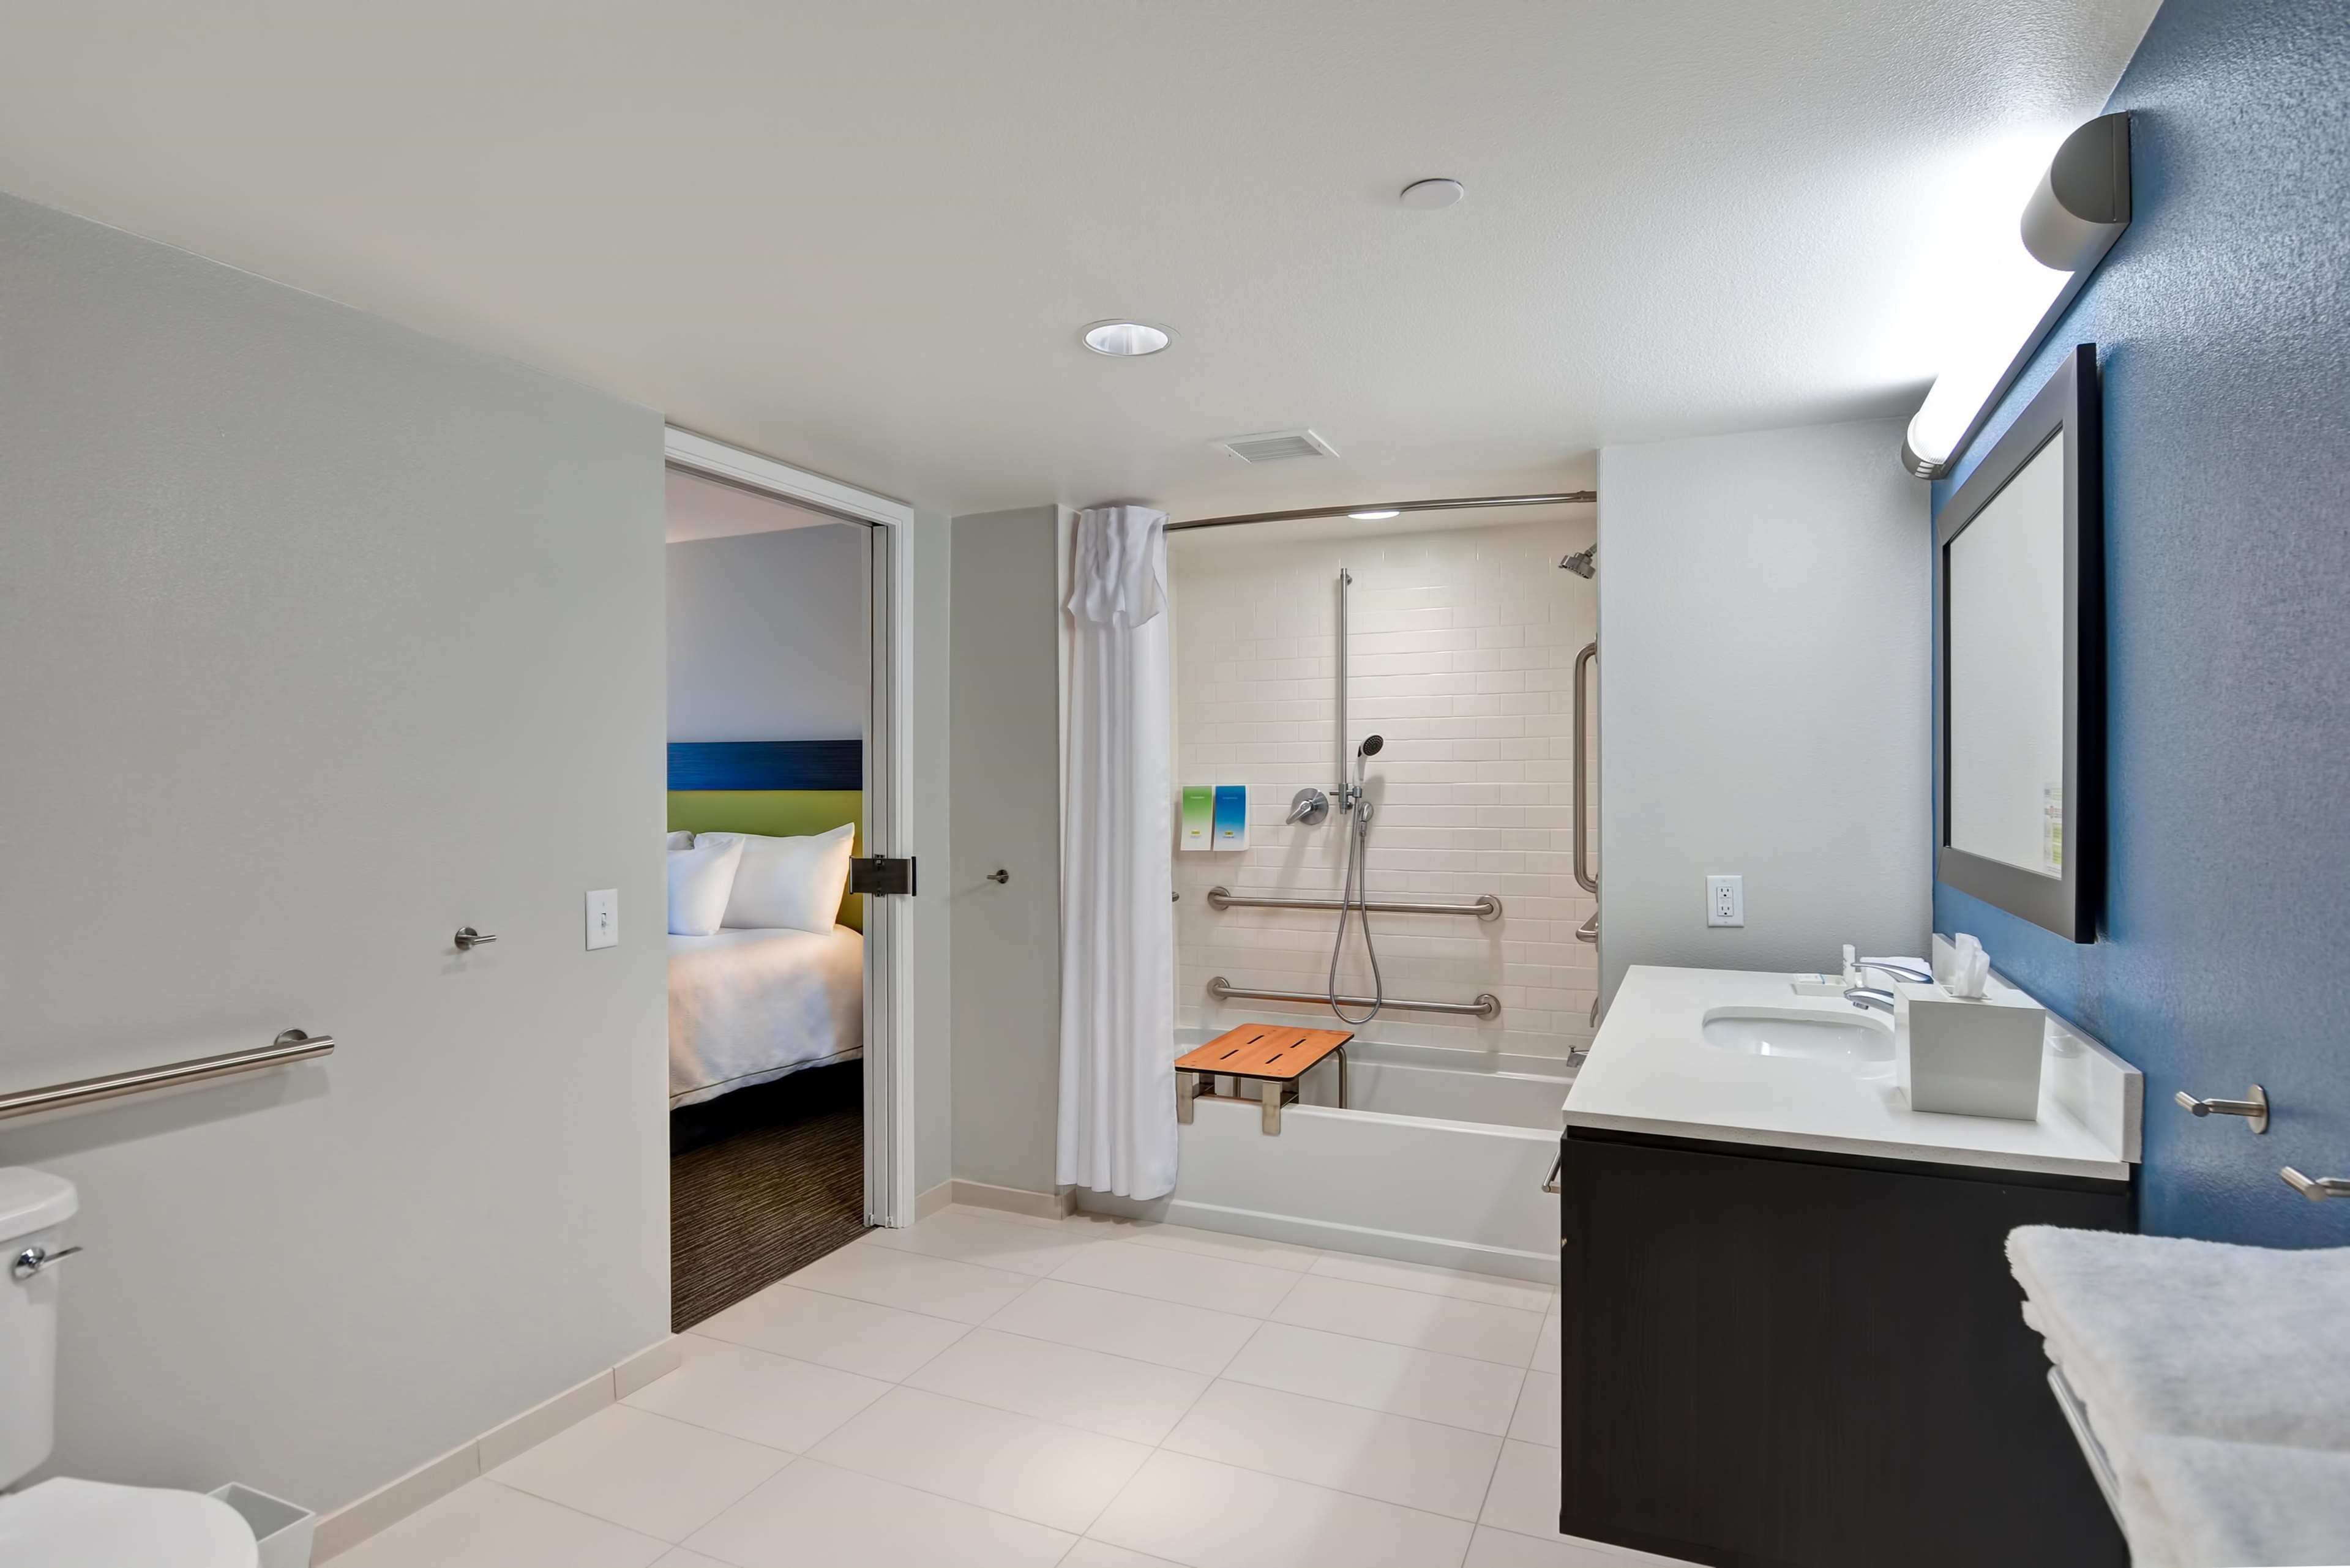 Home2 Suites by Hilton Azusa image 6